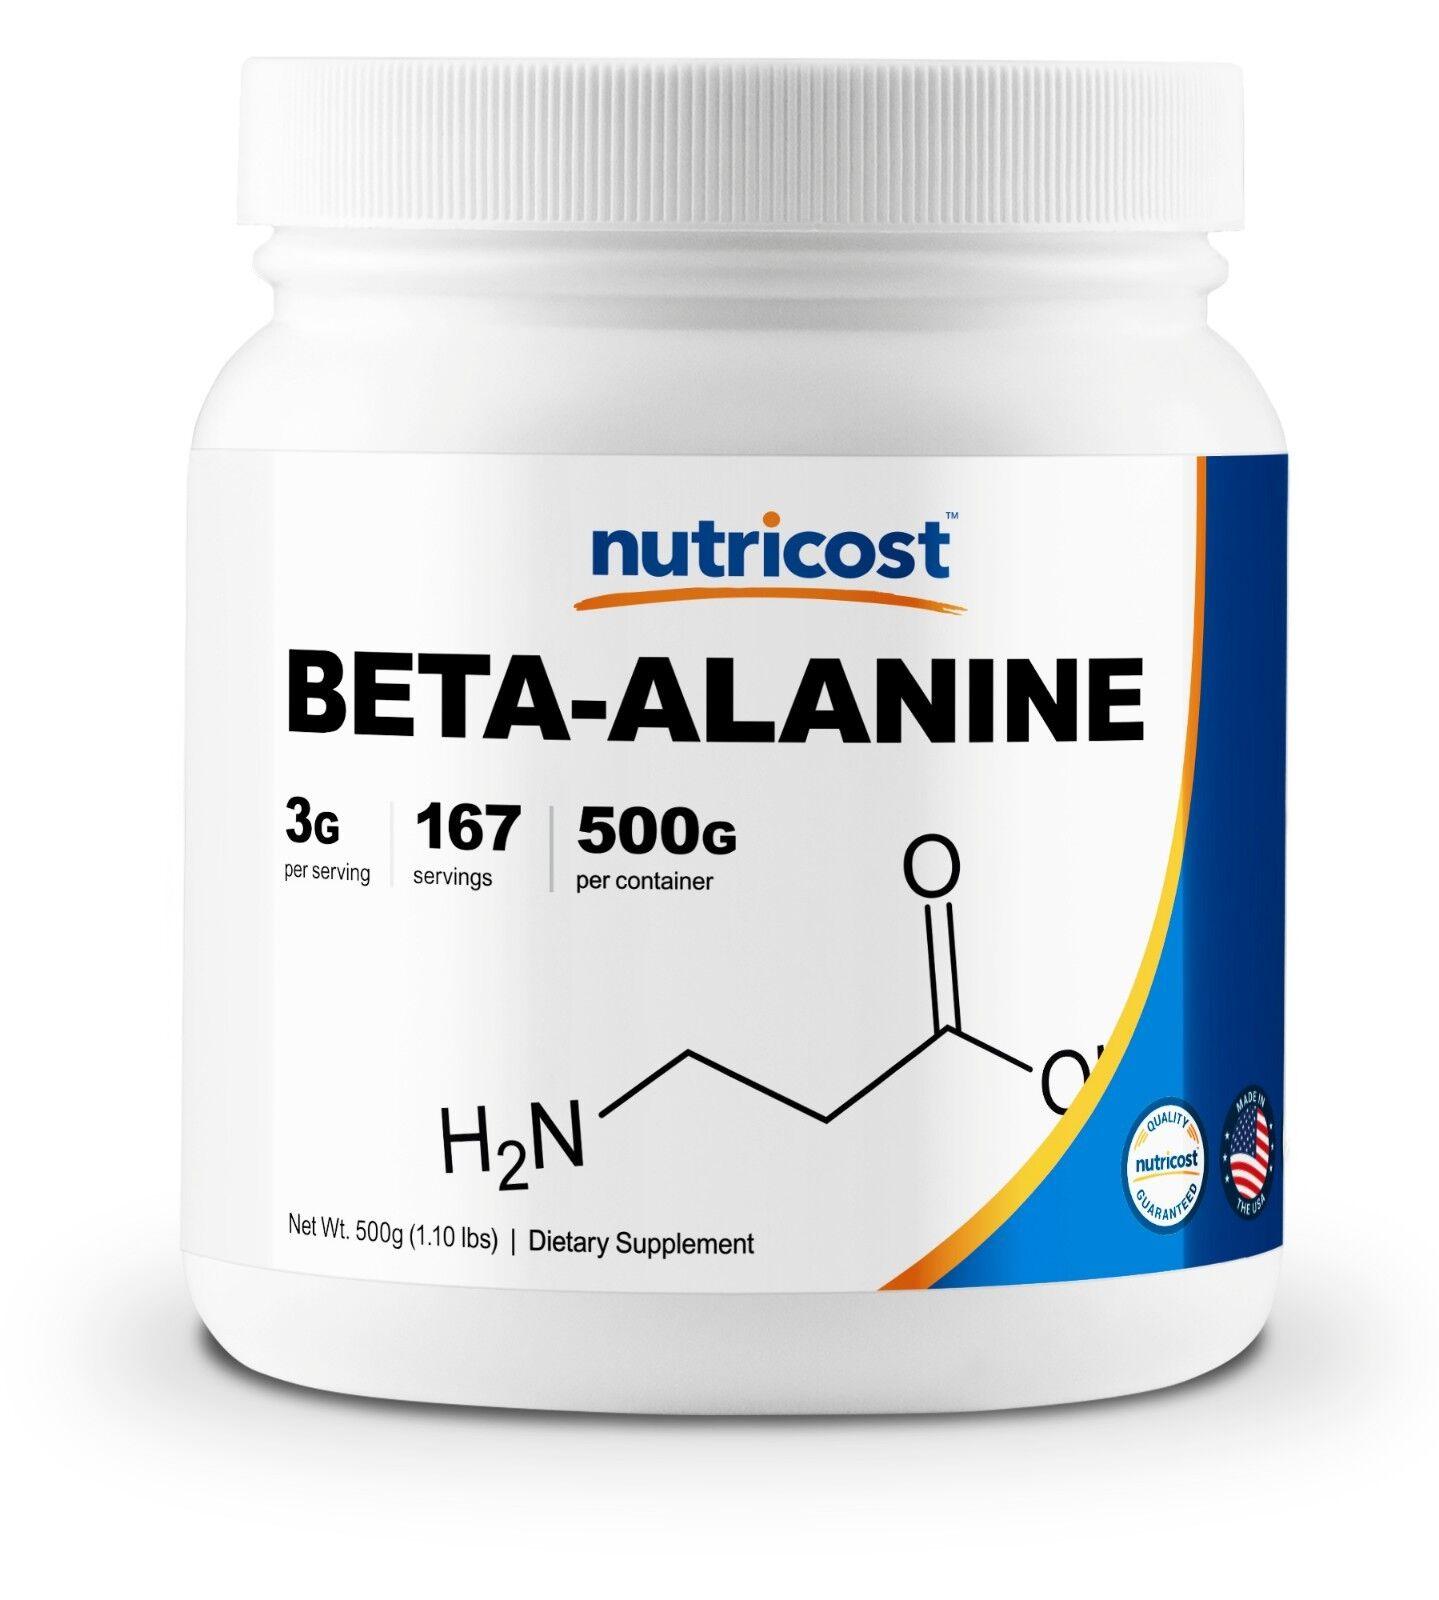 Nutricost Beta Alanine Powder 500 Grams - Pure Beta-Alanine